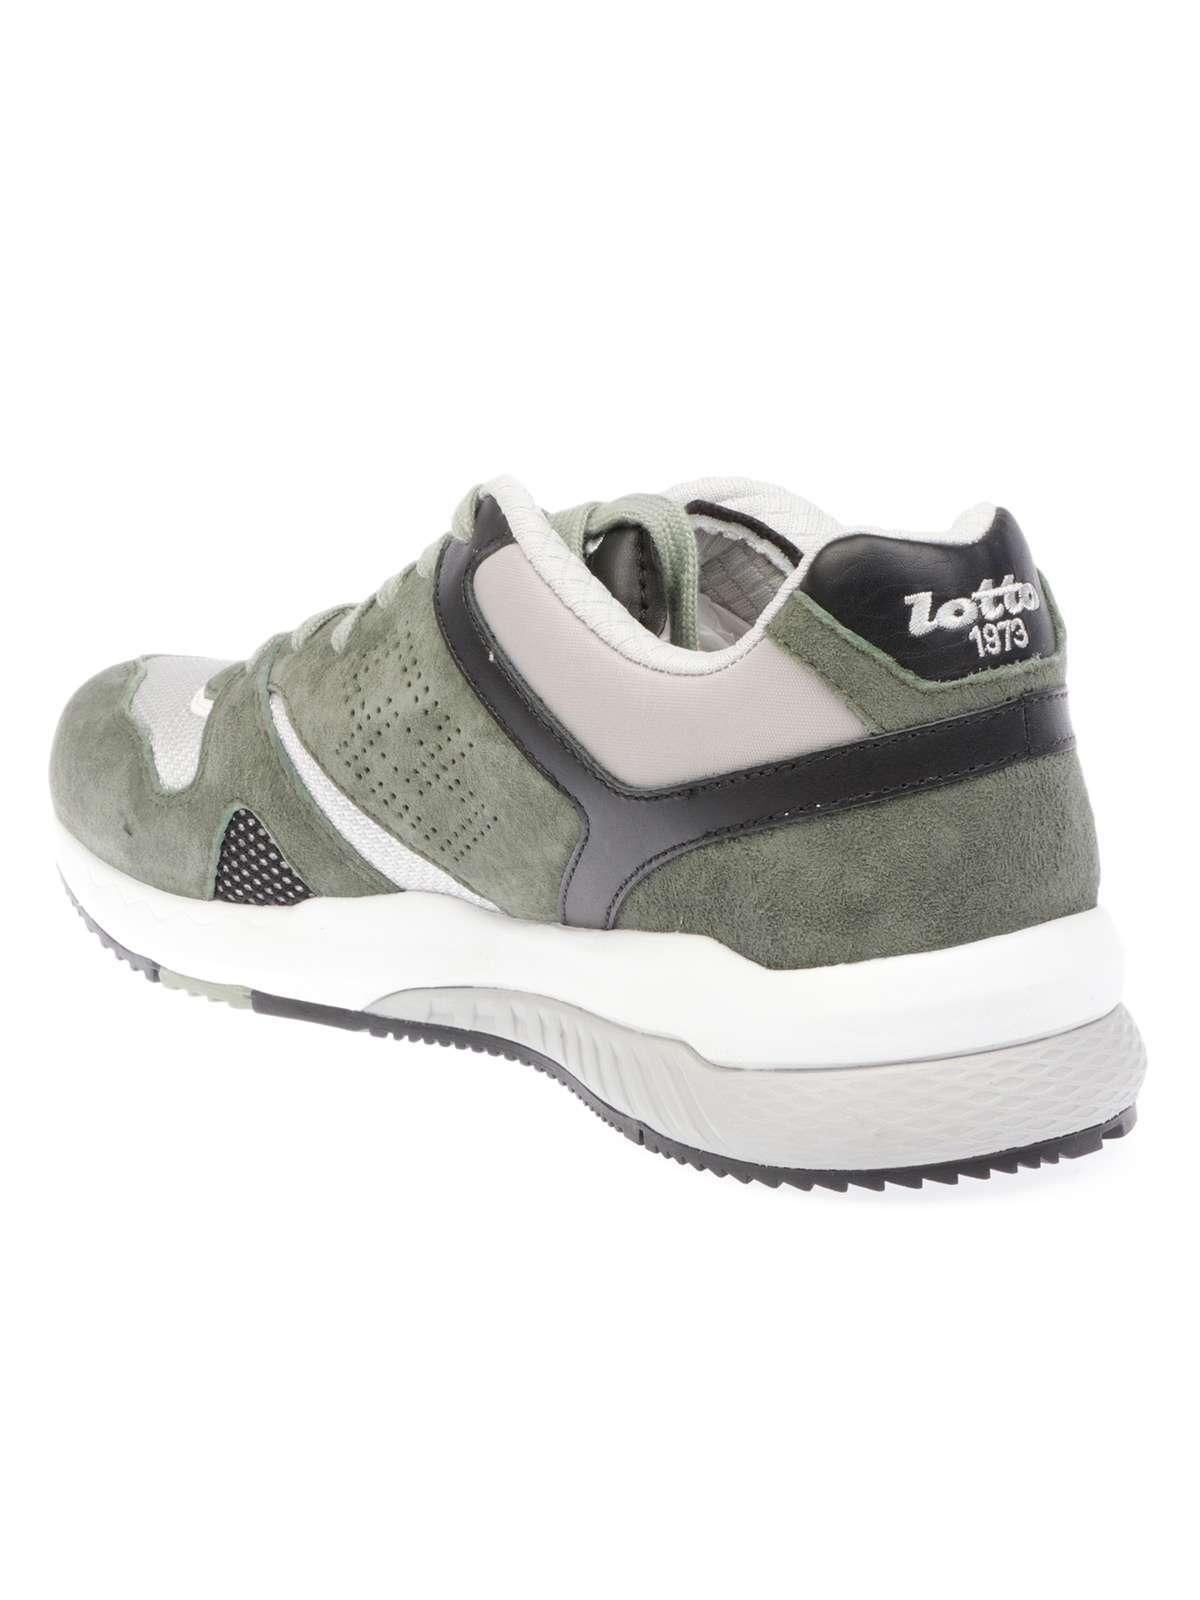 https://www.parmax.com/media/catalog/product/a/i/AI-outlet_parmax-scarpe-uomo-Lotto-211149-C.jpg